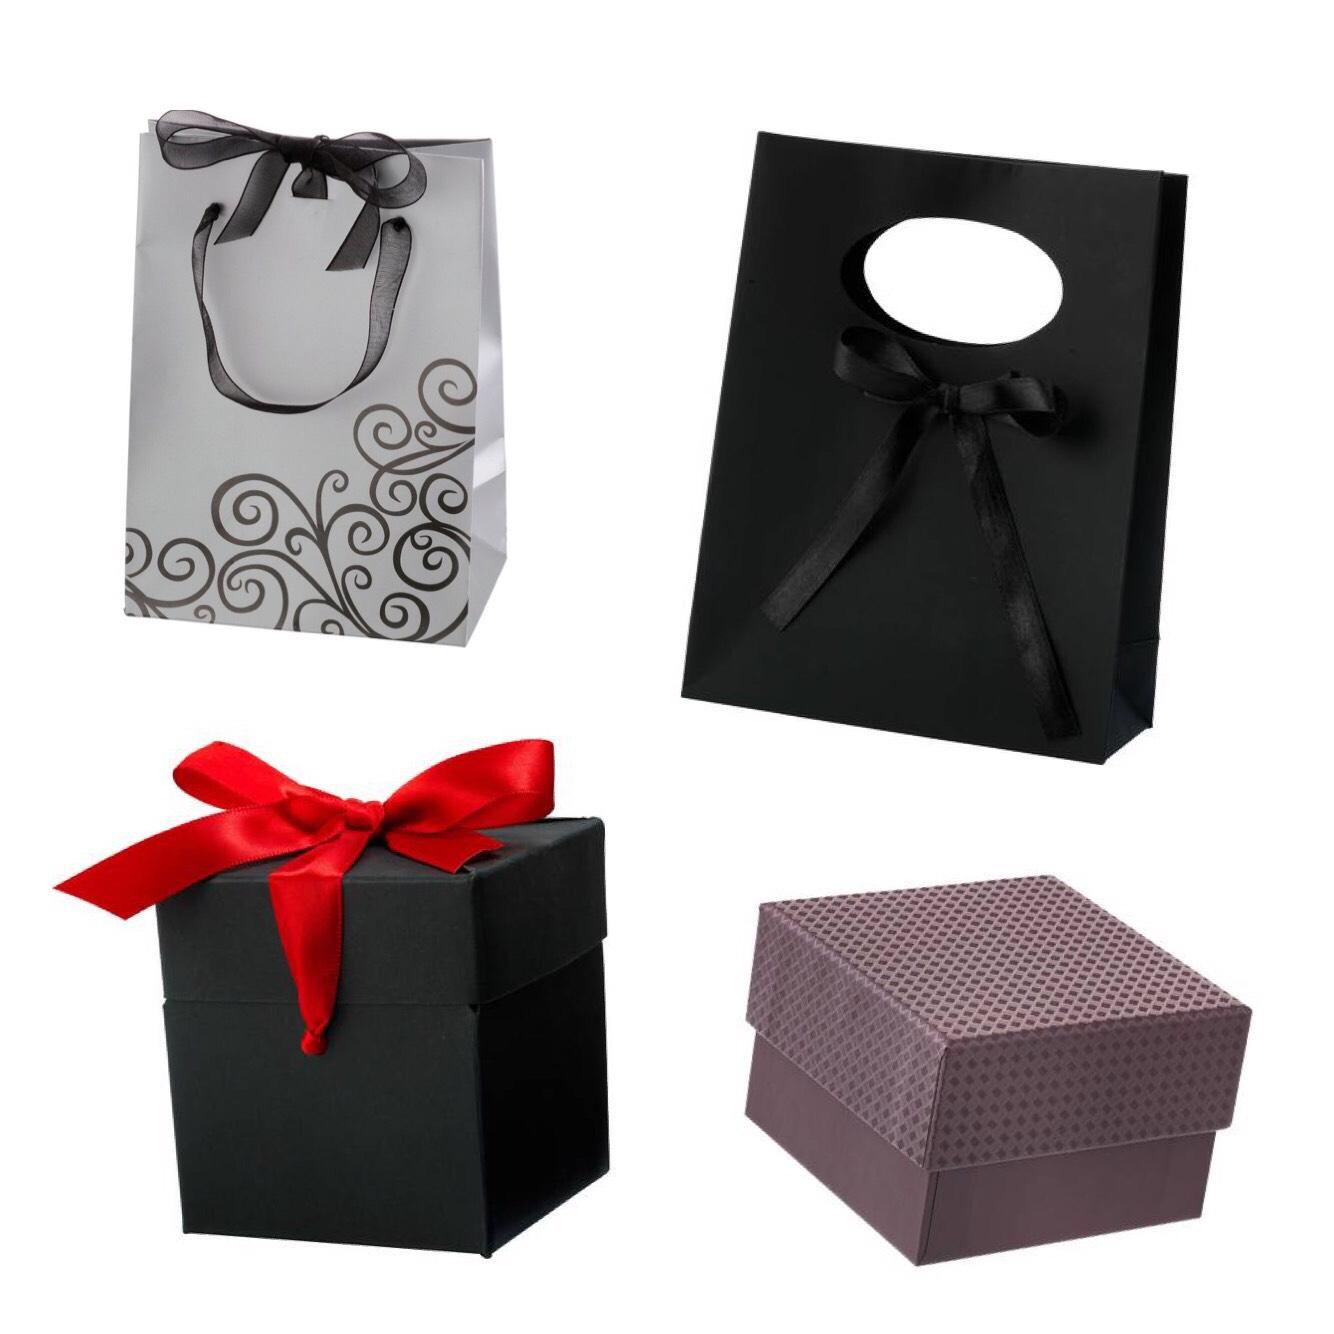 Various Gift bags + boxes 50p @ Argos